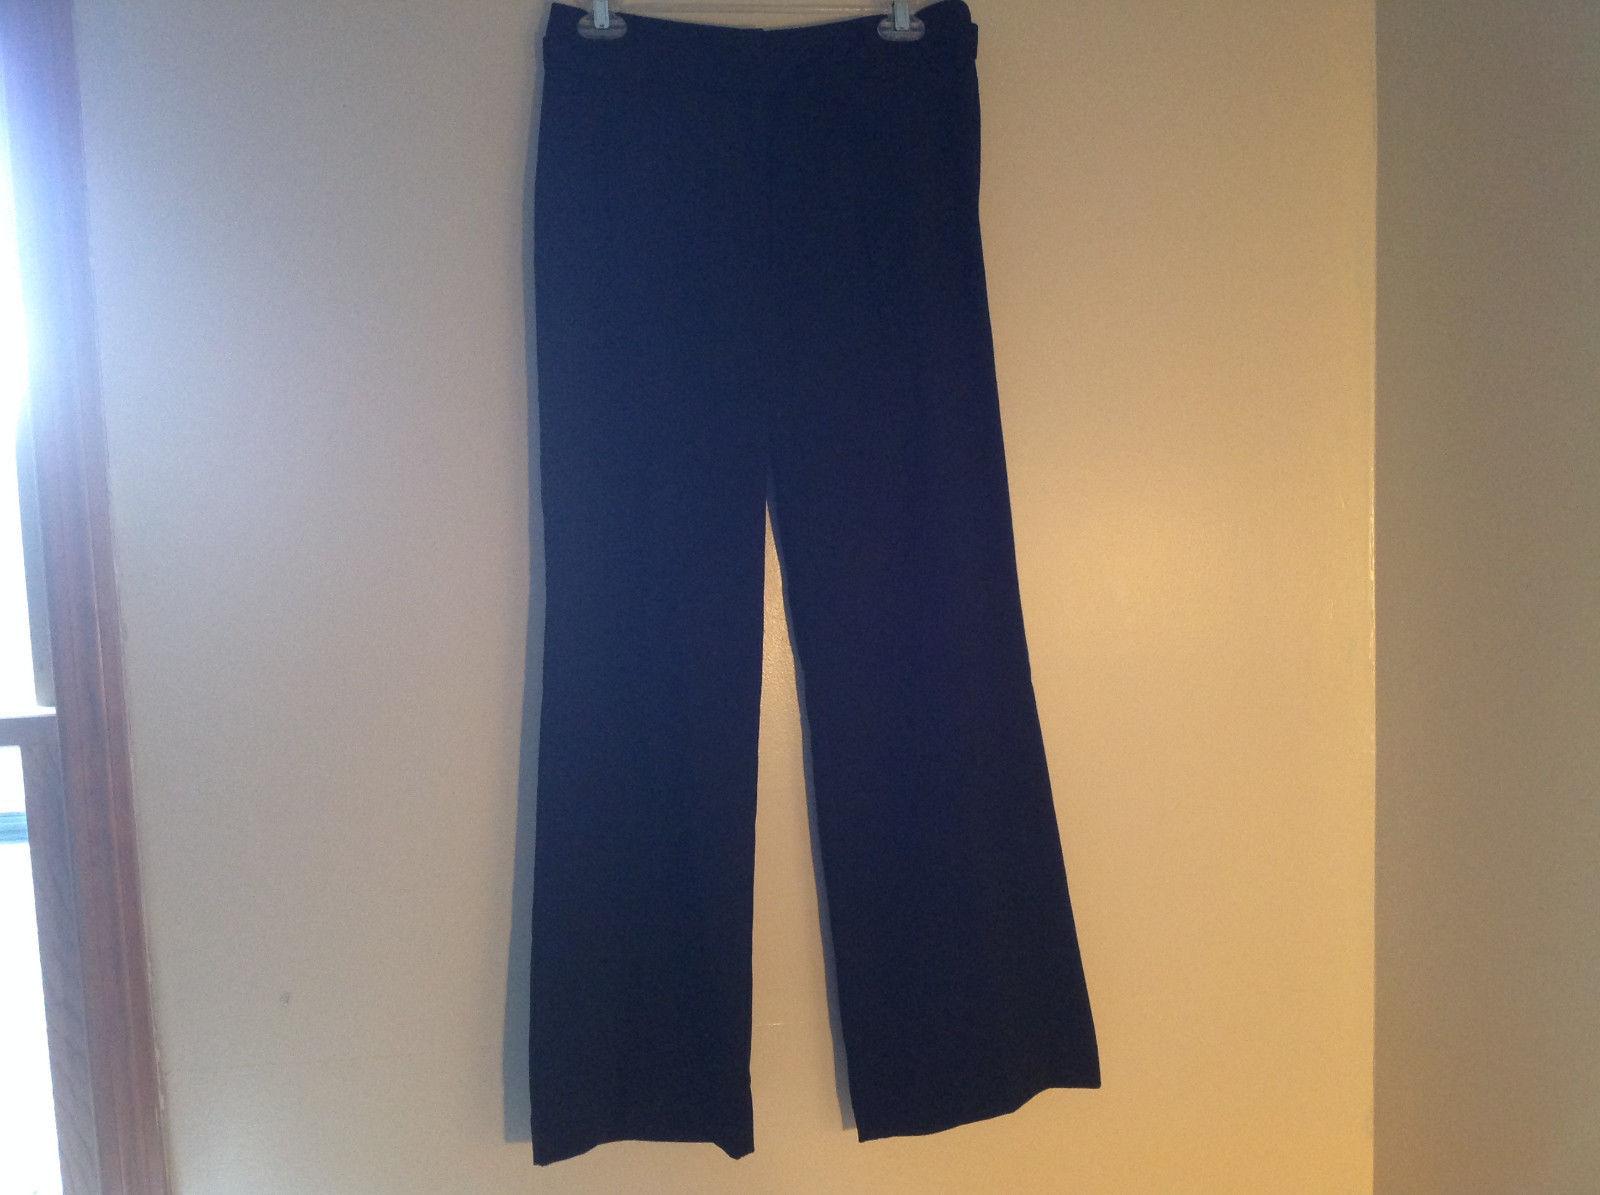 Black Tie Belt Casual Pants Zipper Button 2 Clasp Closure Geoffrey Been Size 4S